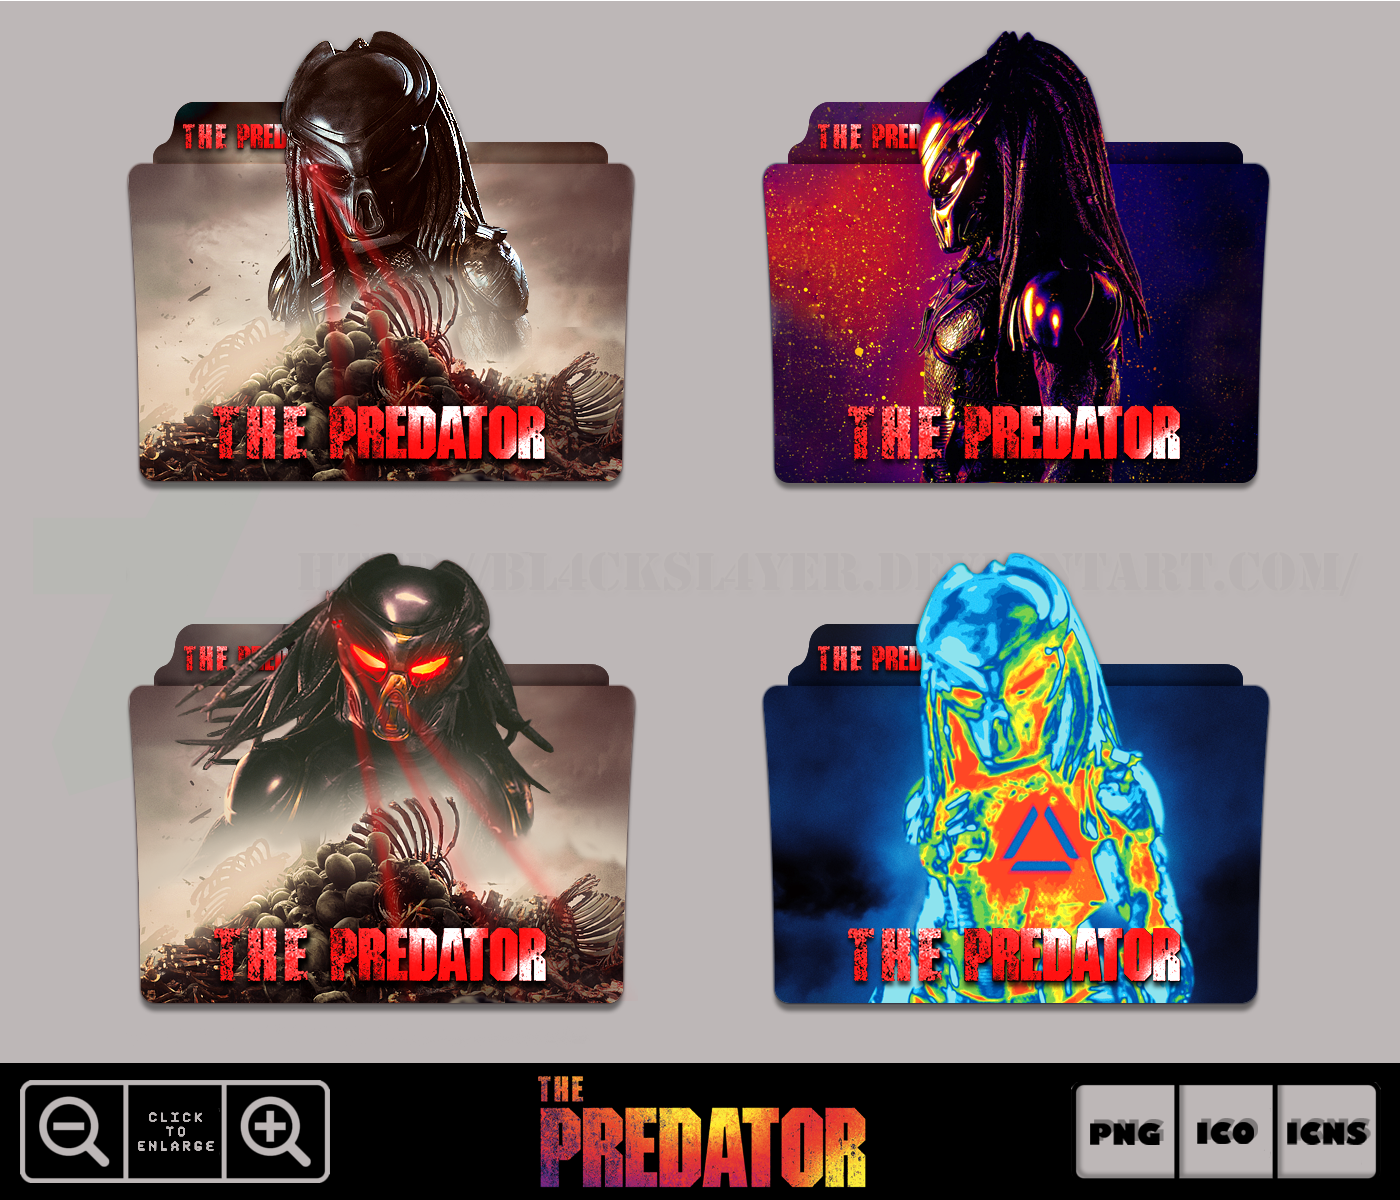 The Predator (2018) Folder Icon Pack by Bl4CKSL4YER